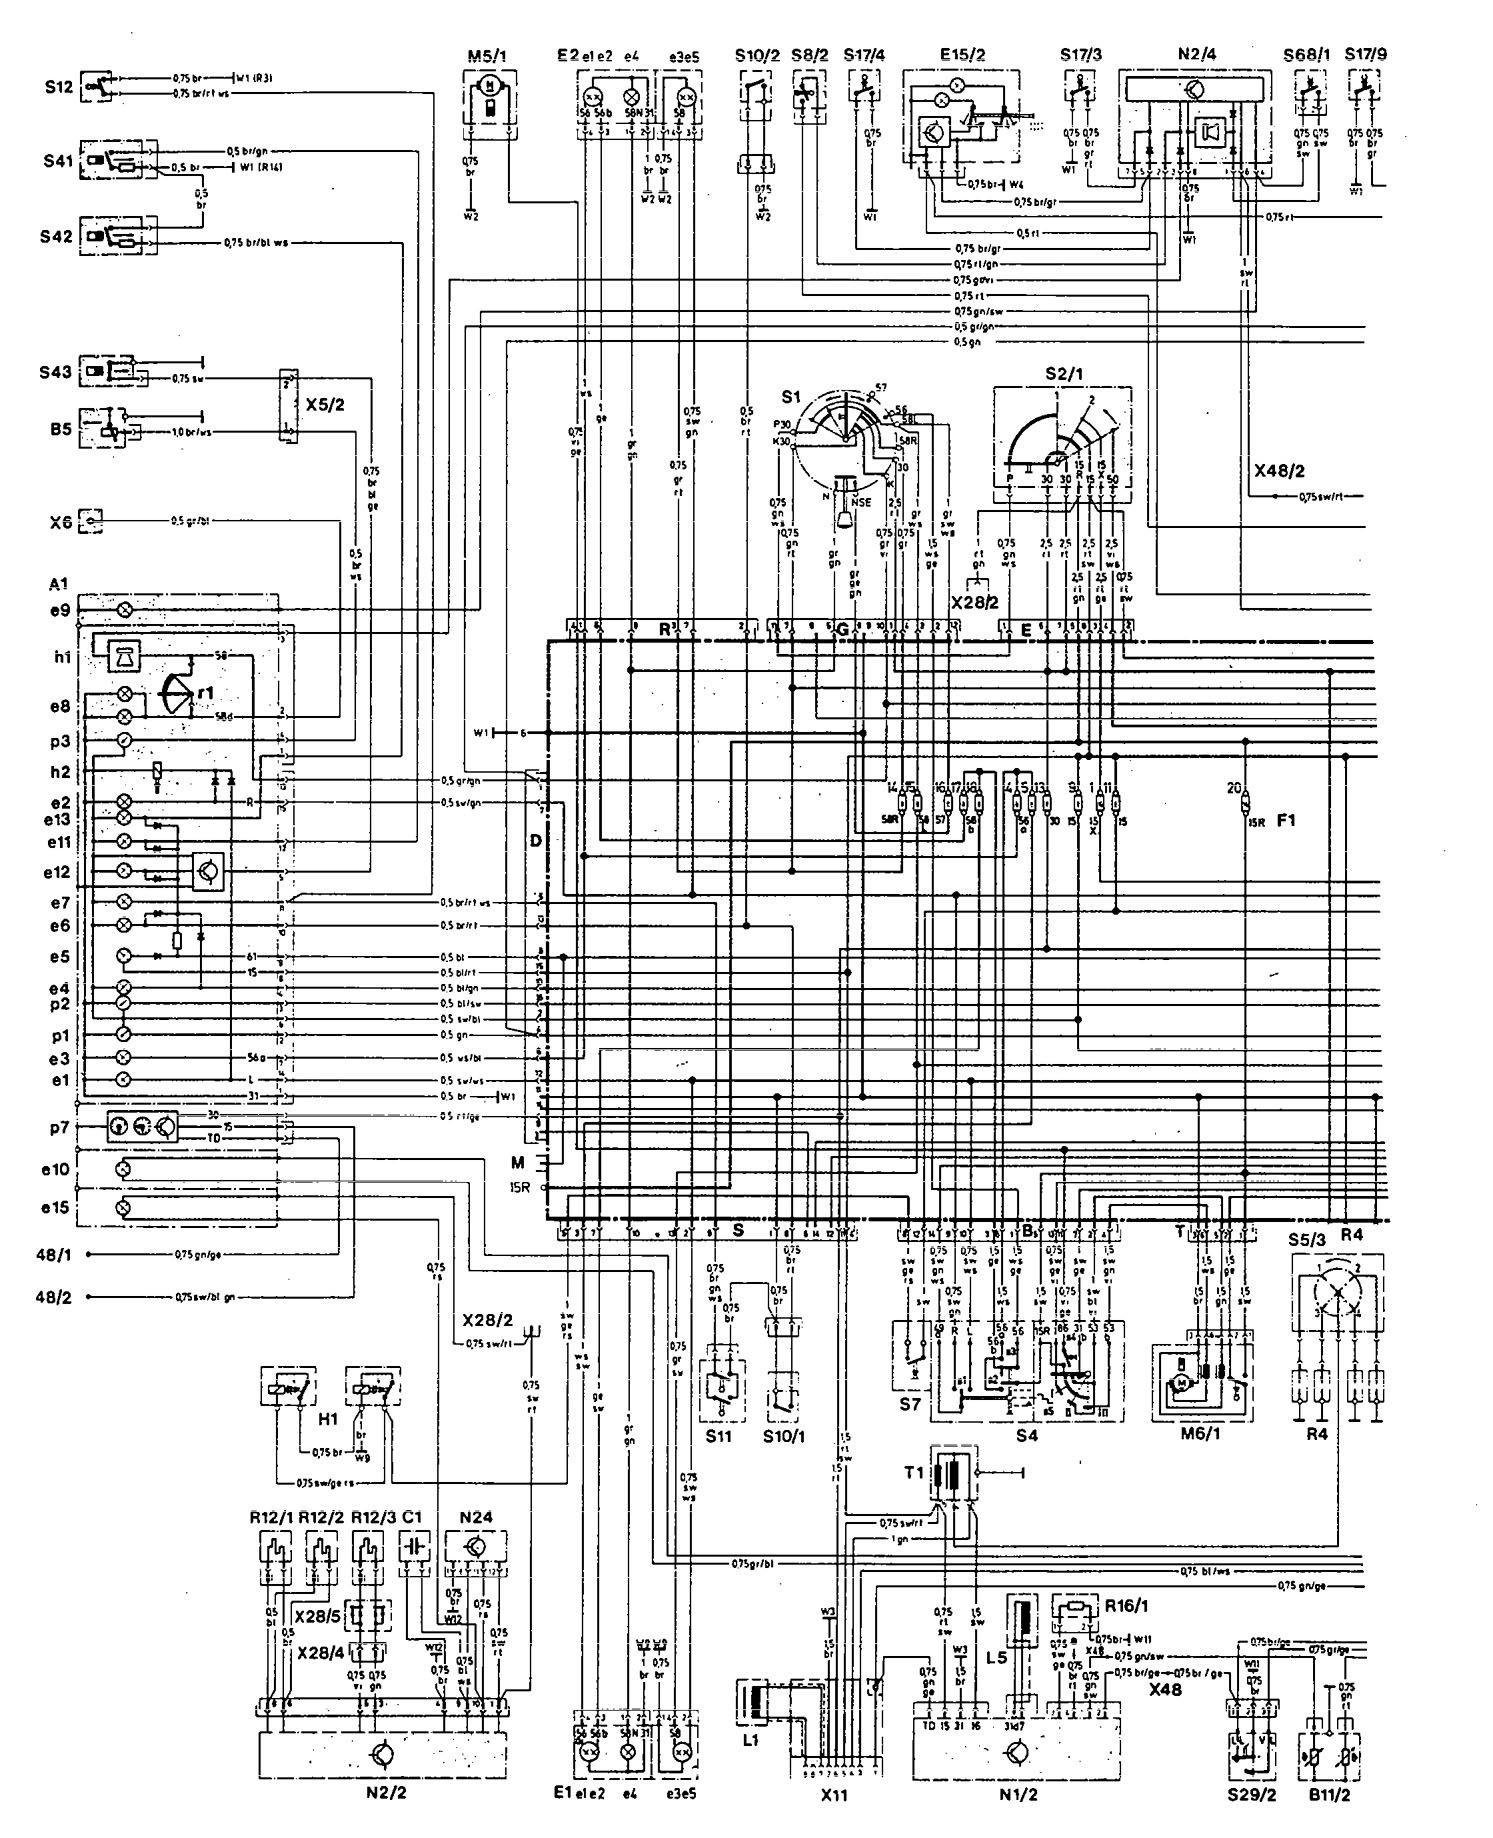 Diagram  Mercedes Benz Wiring Diagrams W107 Full Version